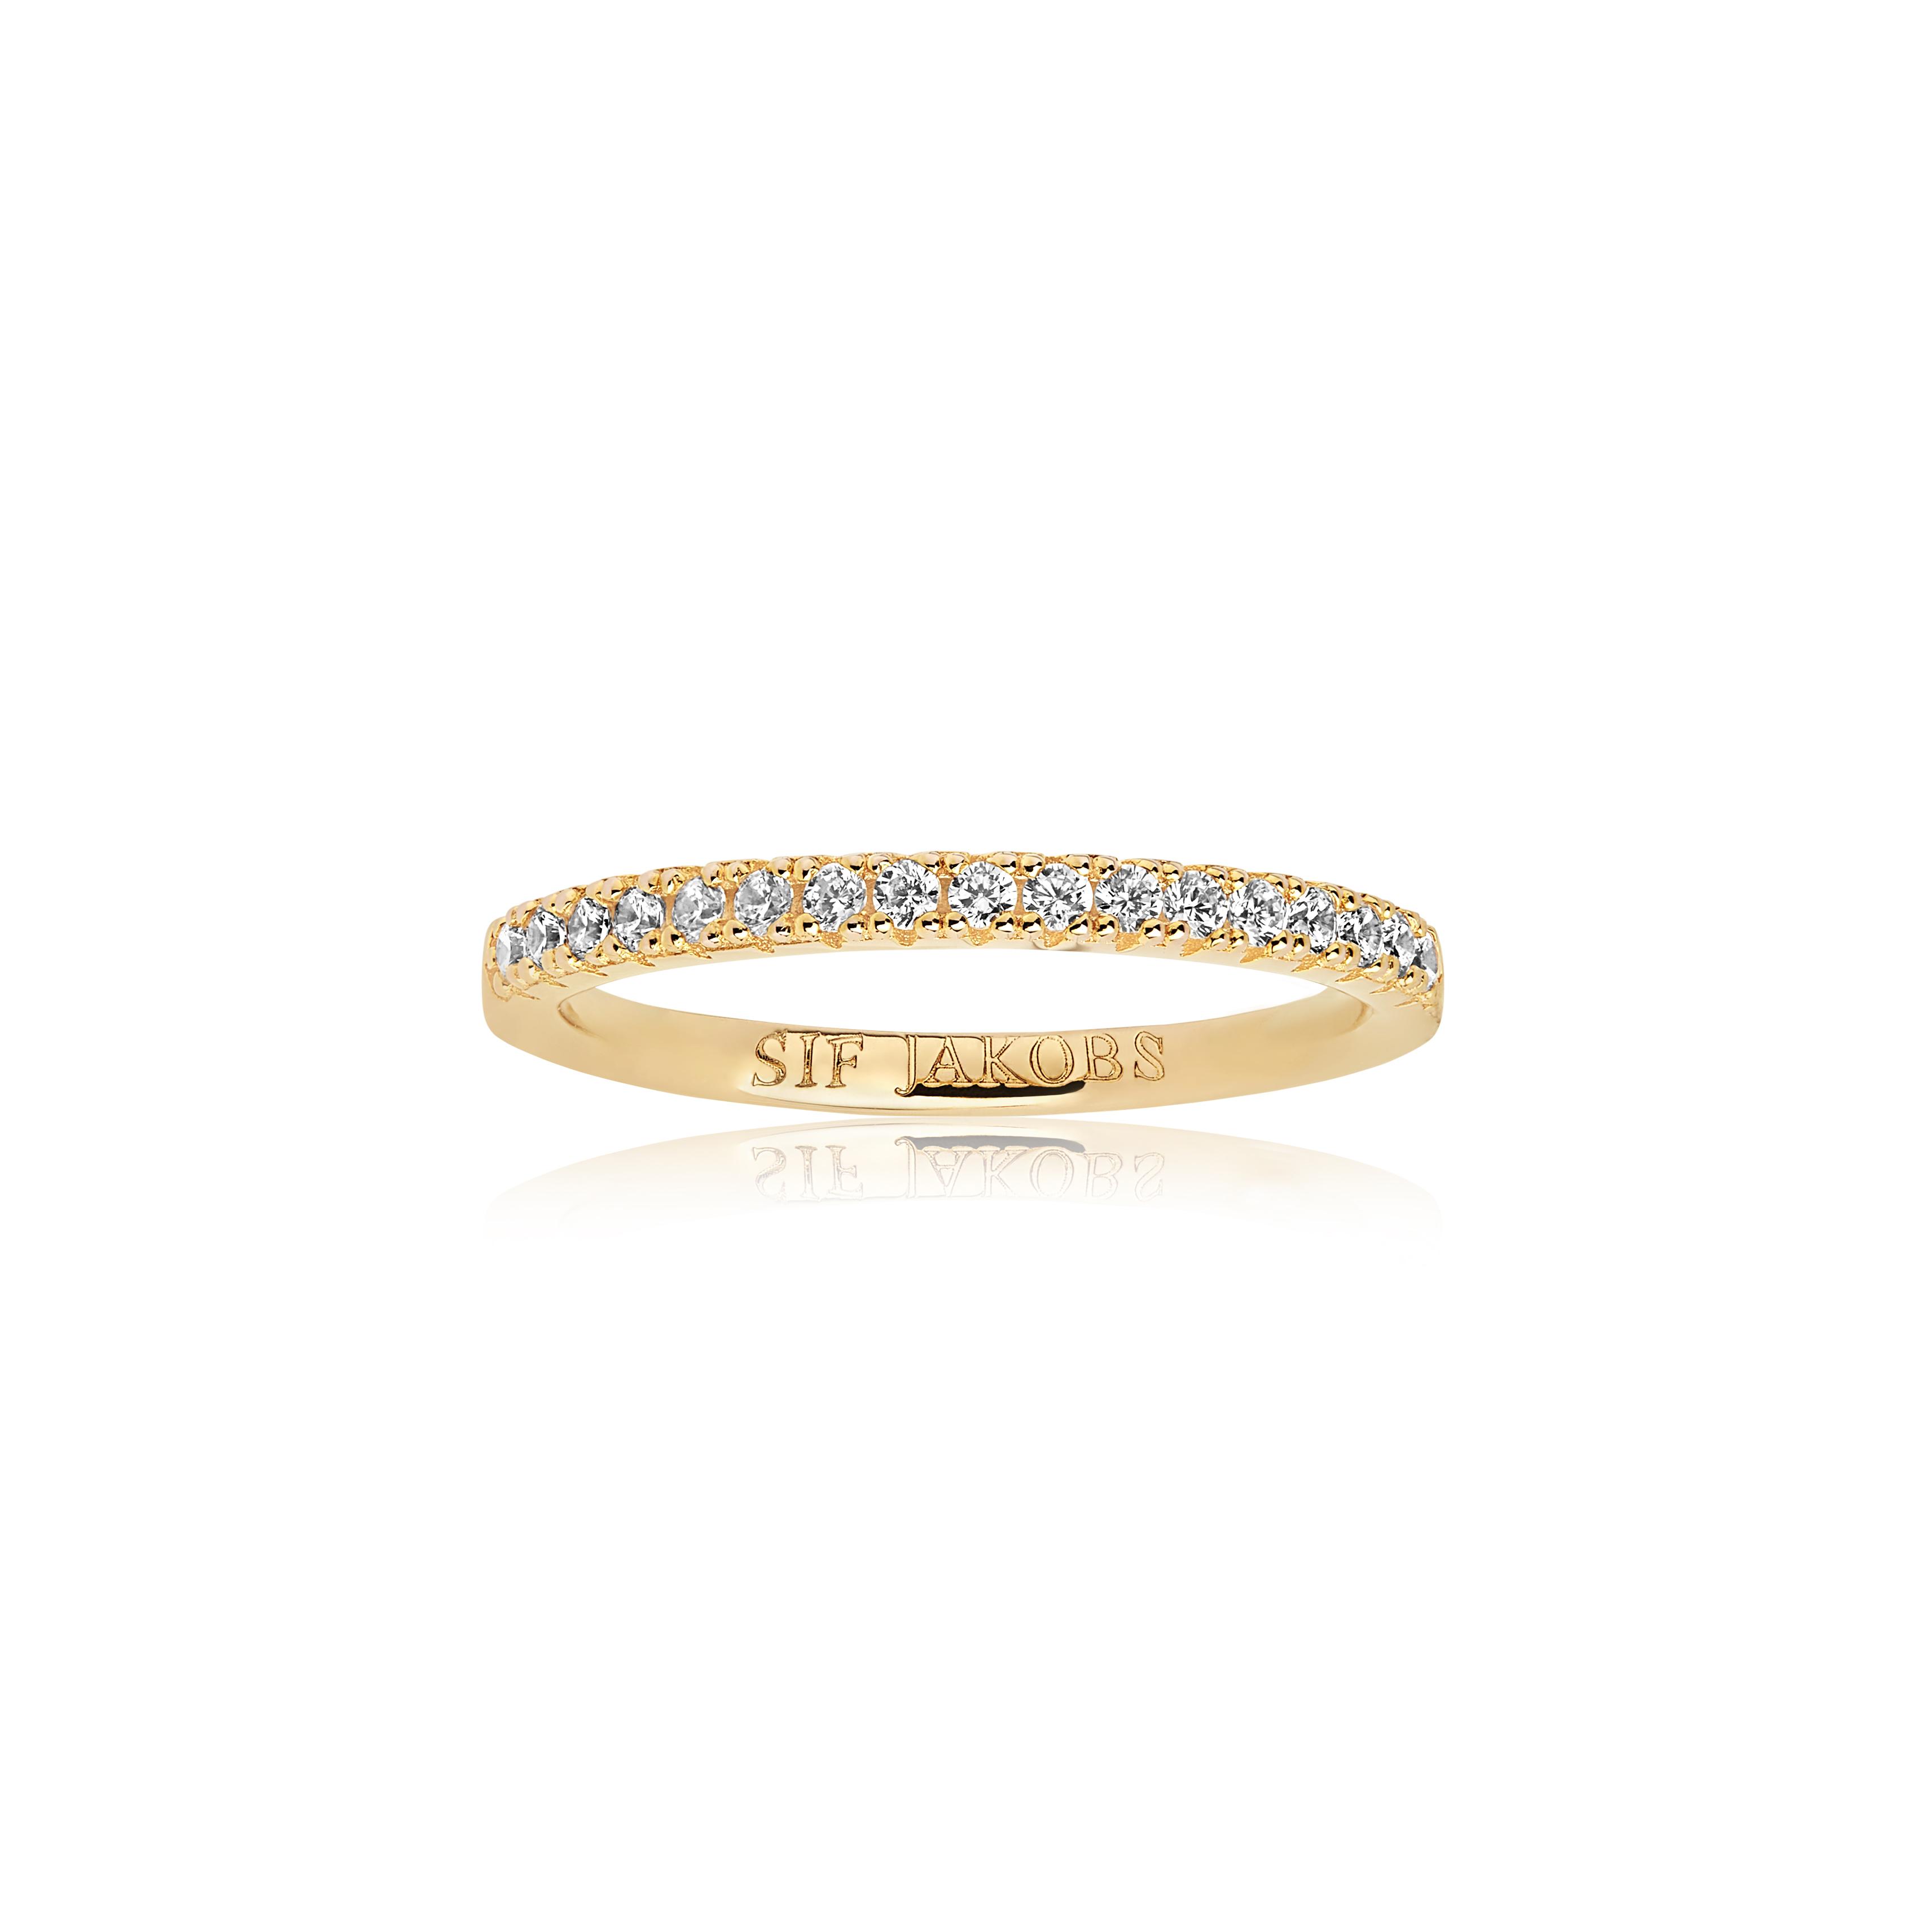 Sif Jakobs Jewellery Ellera ring, guld/hvid, 56